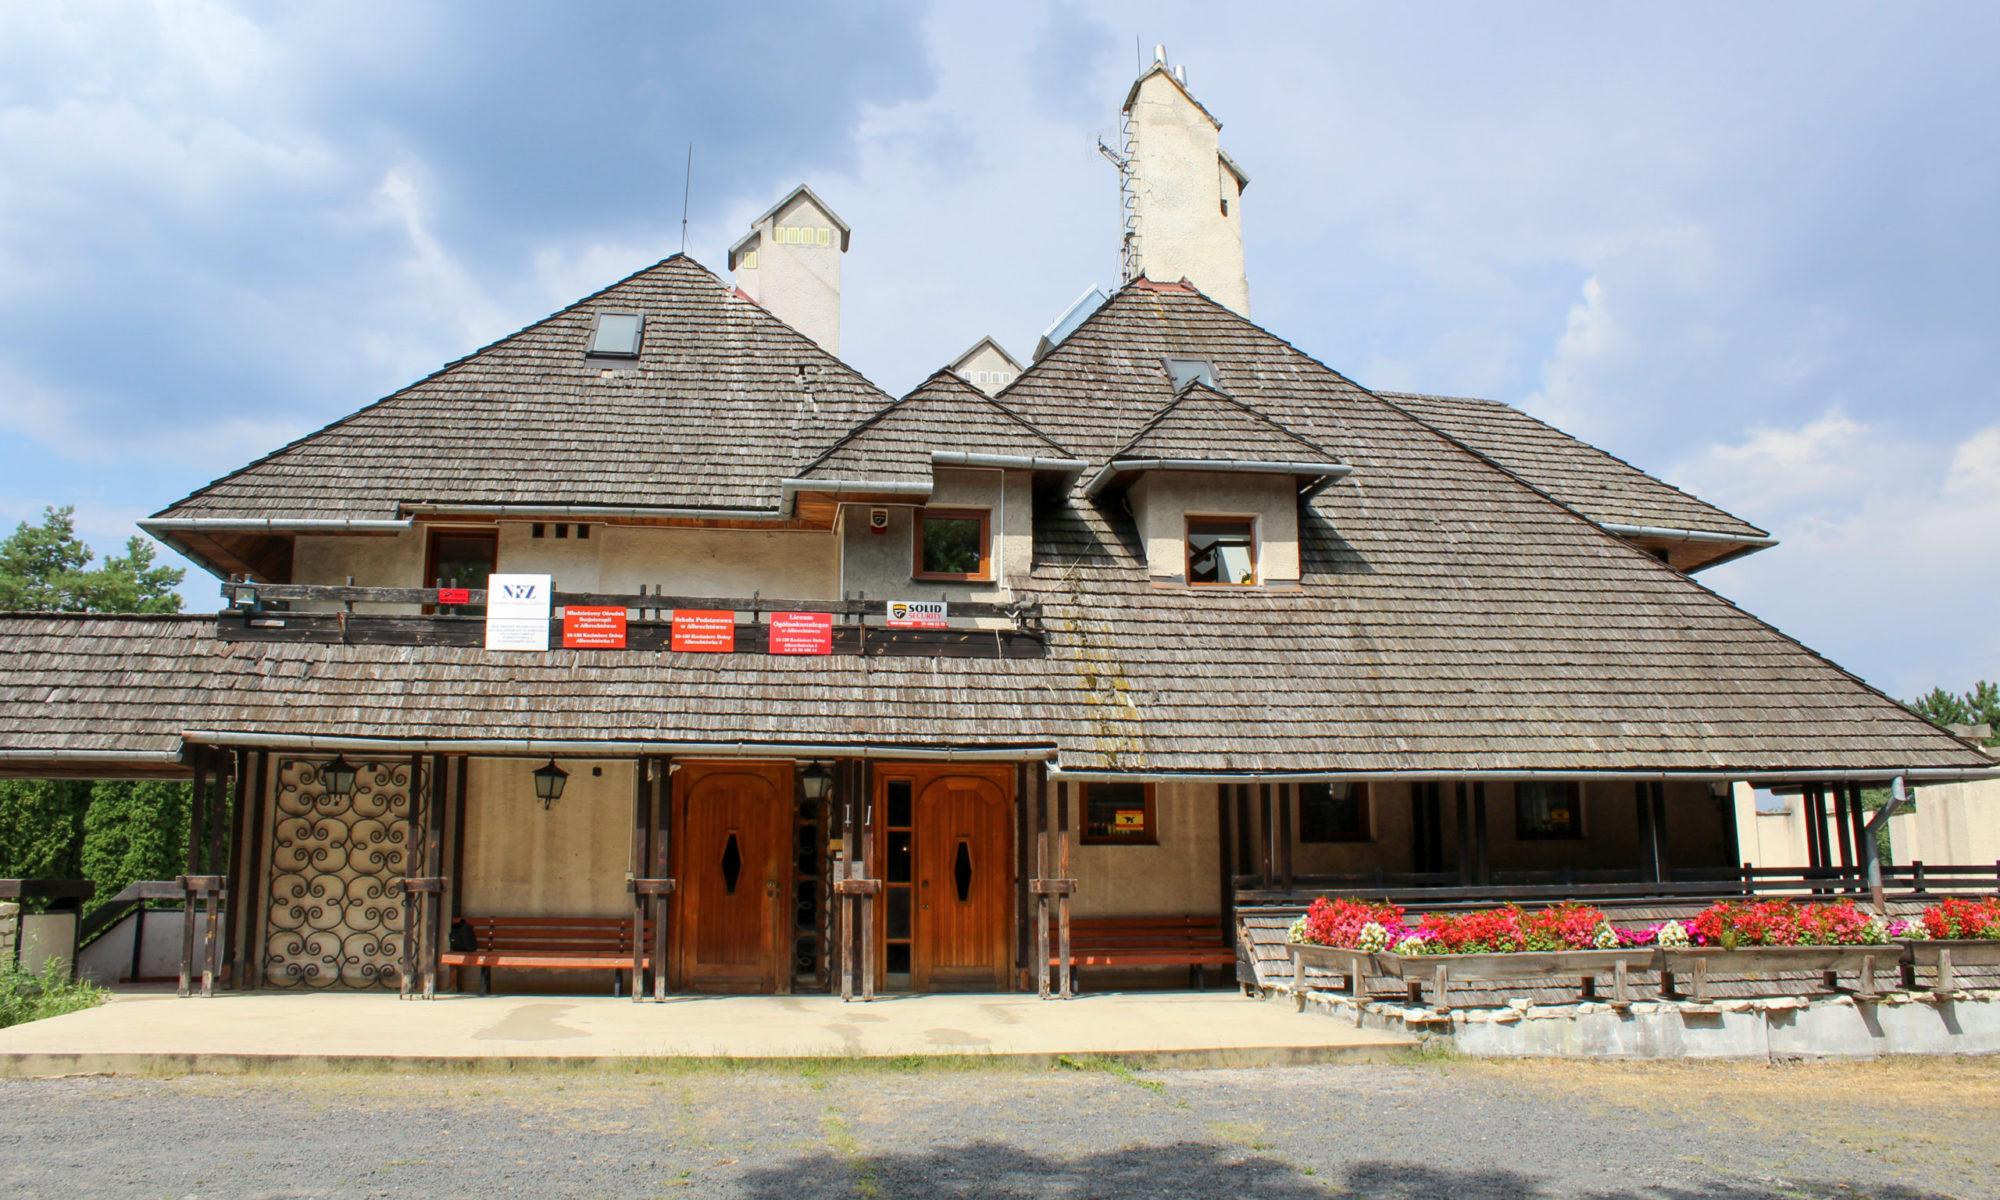 Ośrodek w Albrechtówce